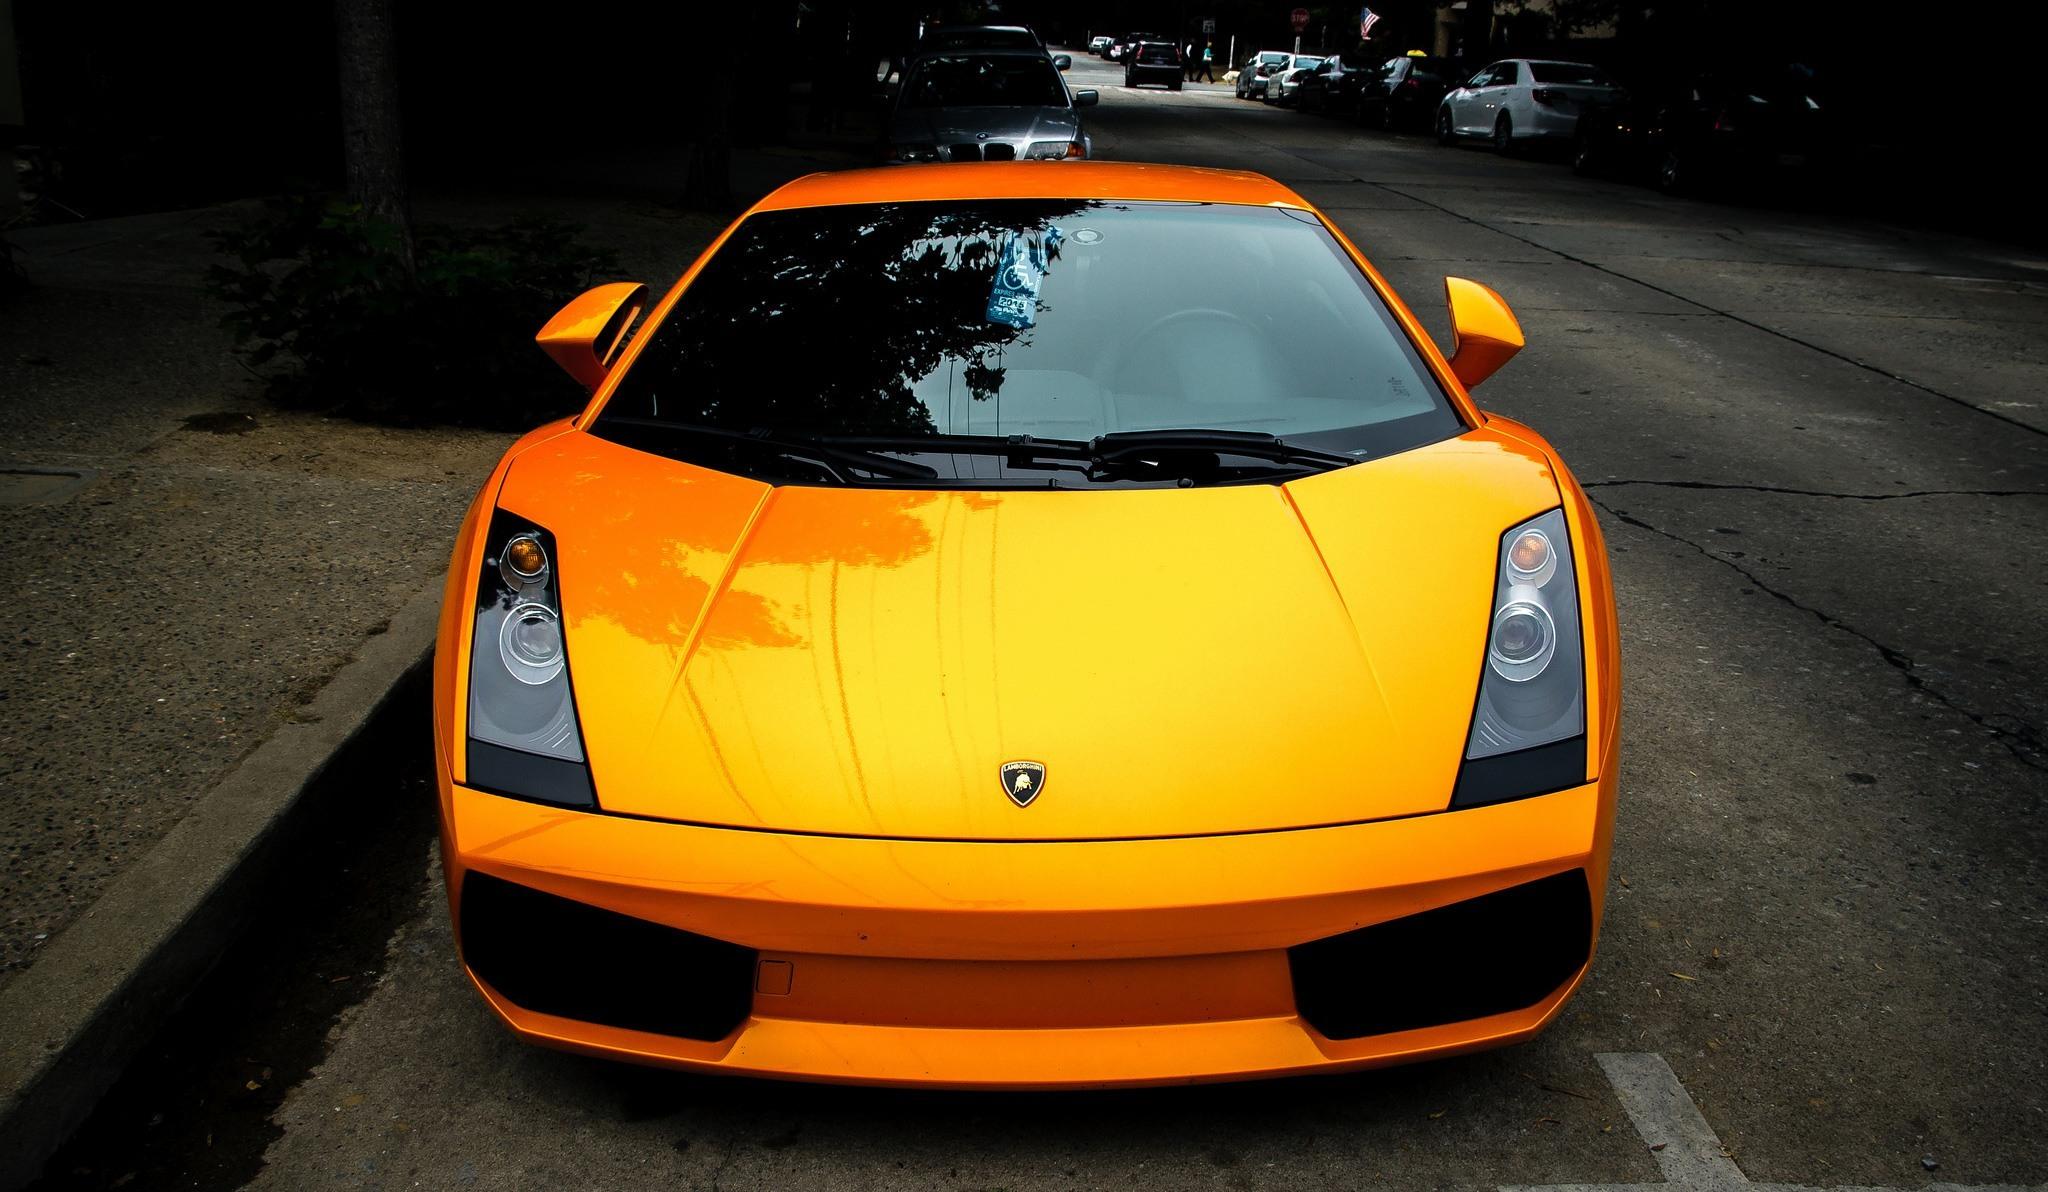 HD Quality Wallpaper   Collection: Vehicles, 2048x1192 Lamborghini Gallardo